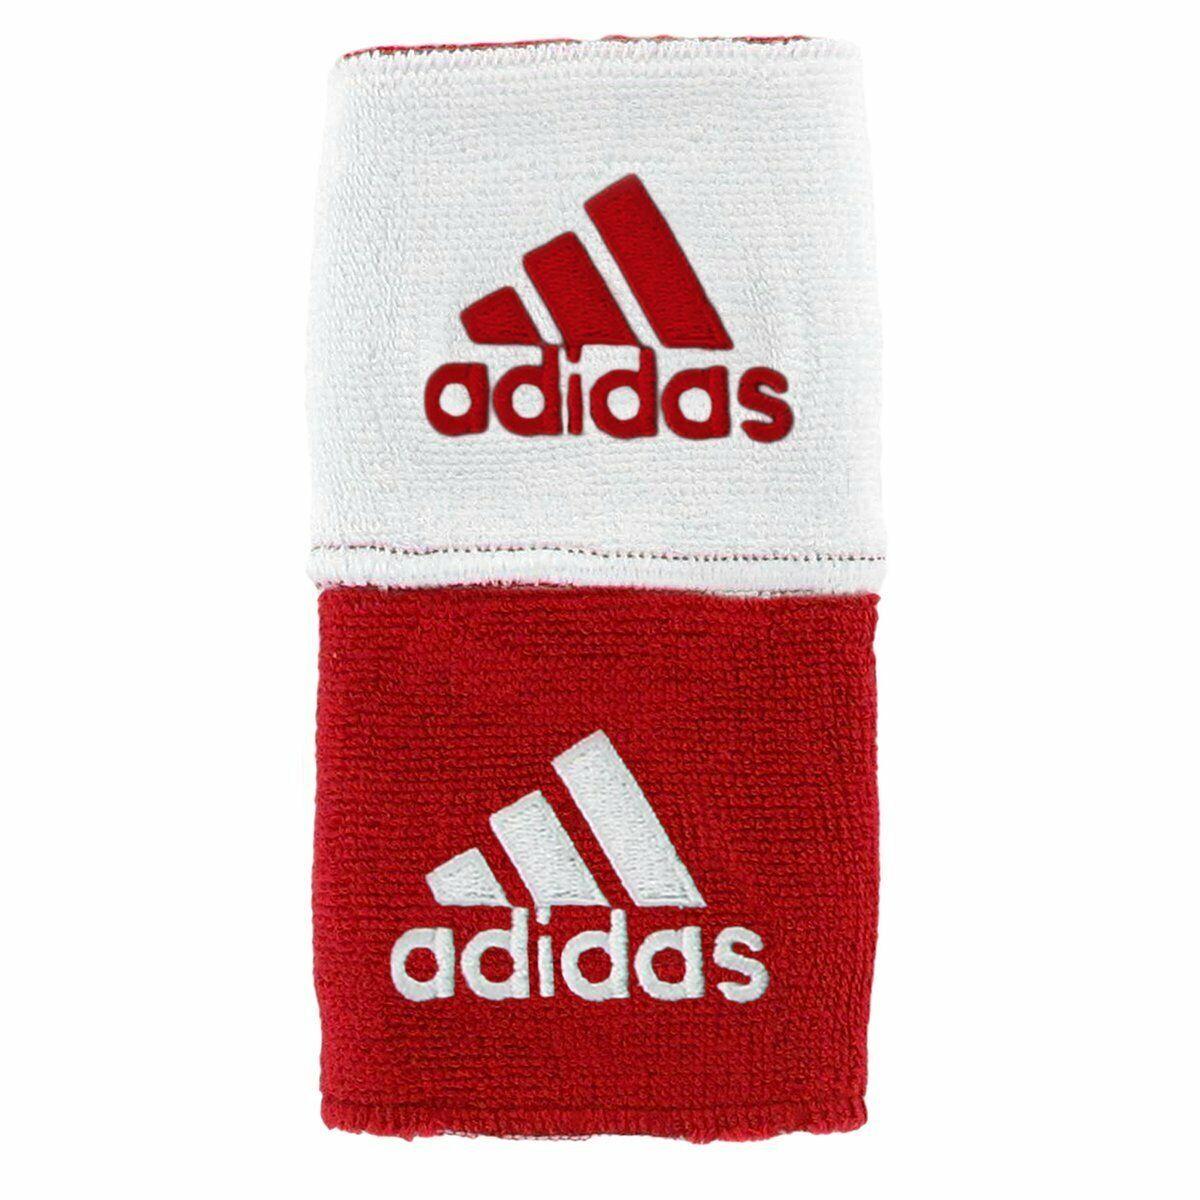 Adidas Reversible Sweat Wristband Men Womens Tennis Running